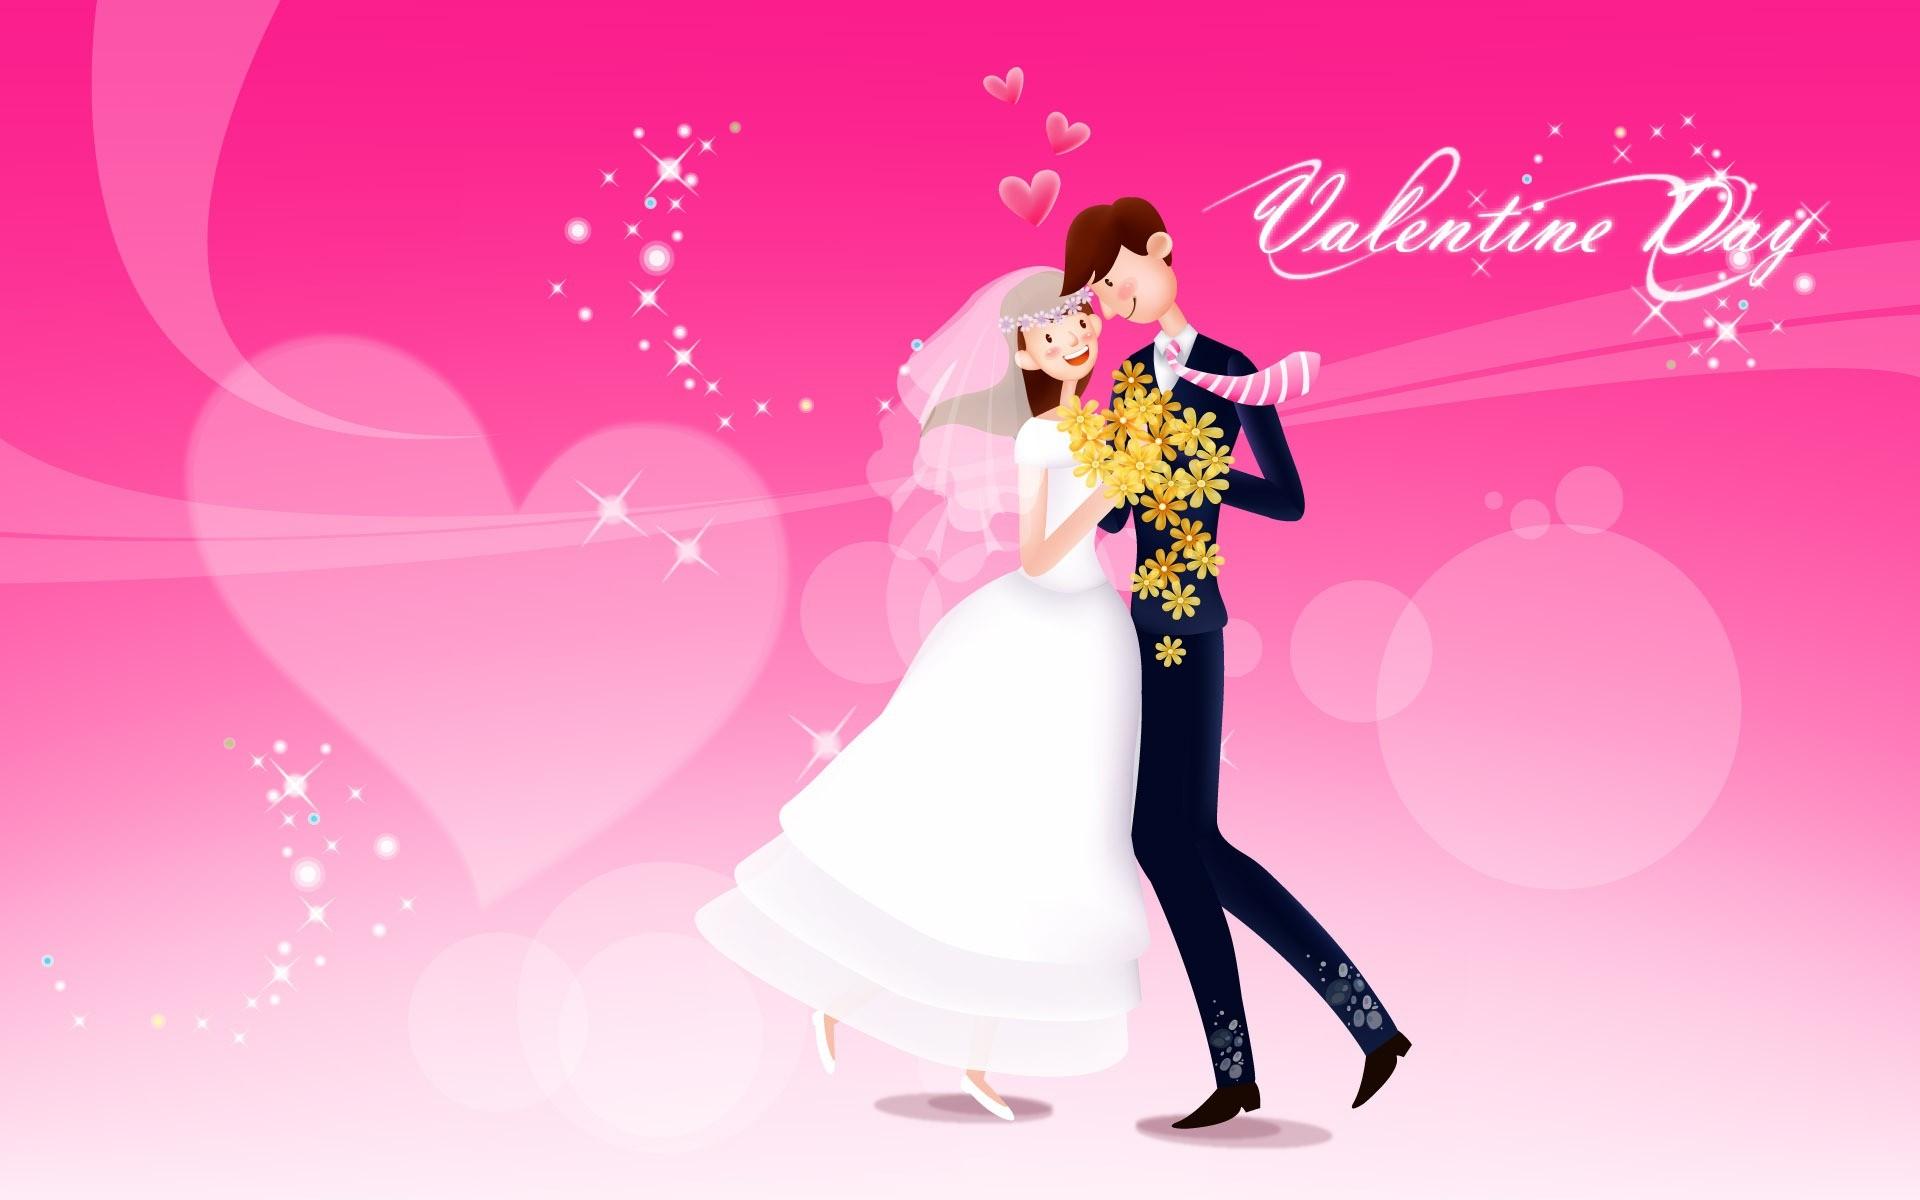 Valentine Day Love Dance WallPaper HD – https://imashon.com/love